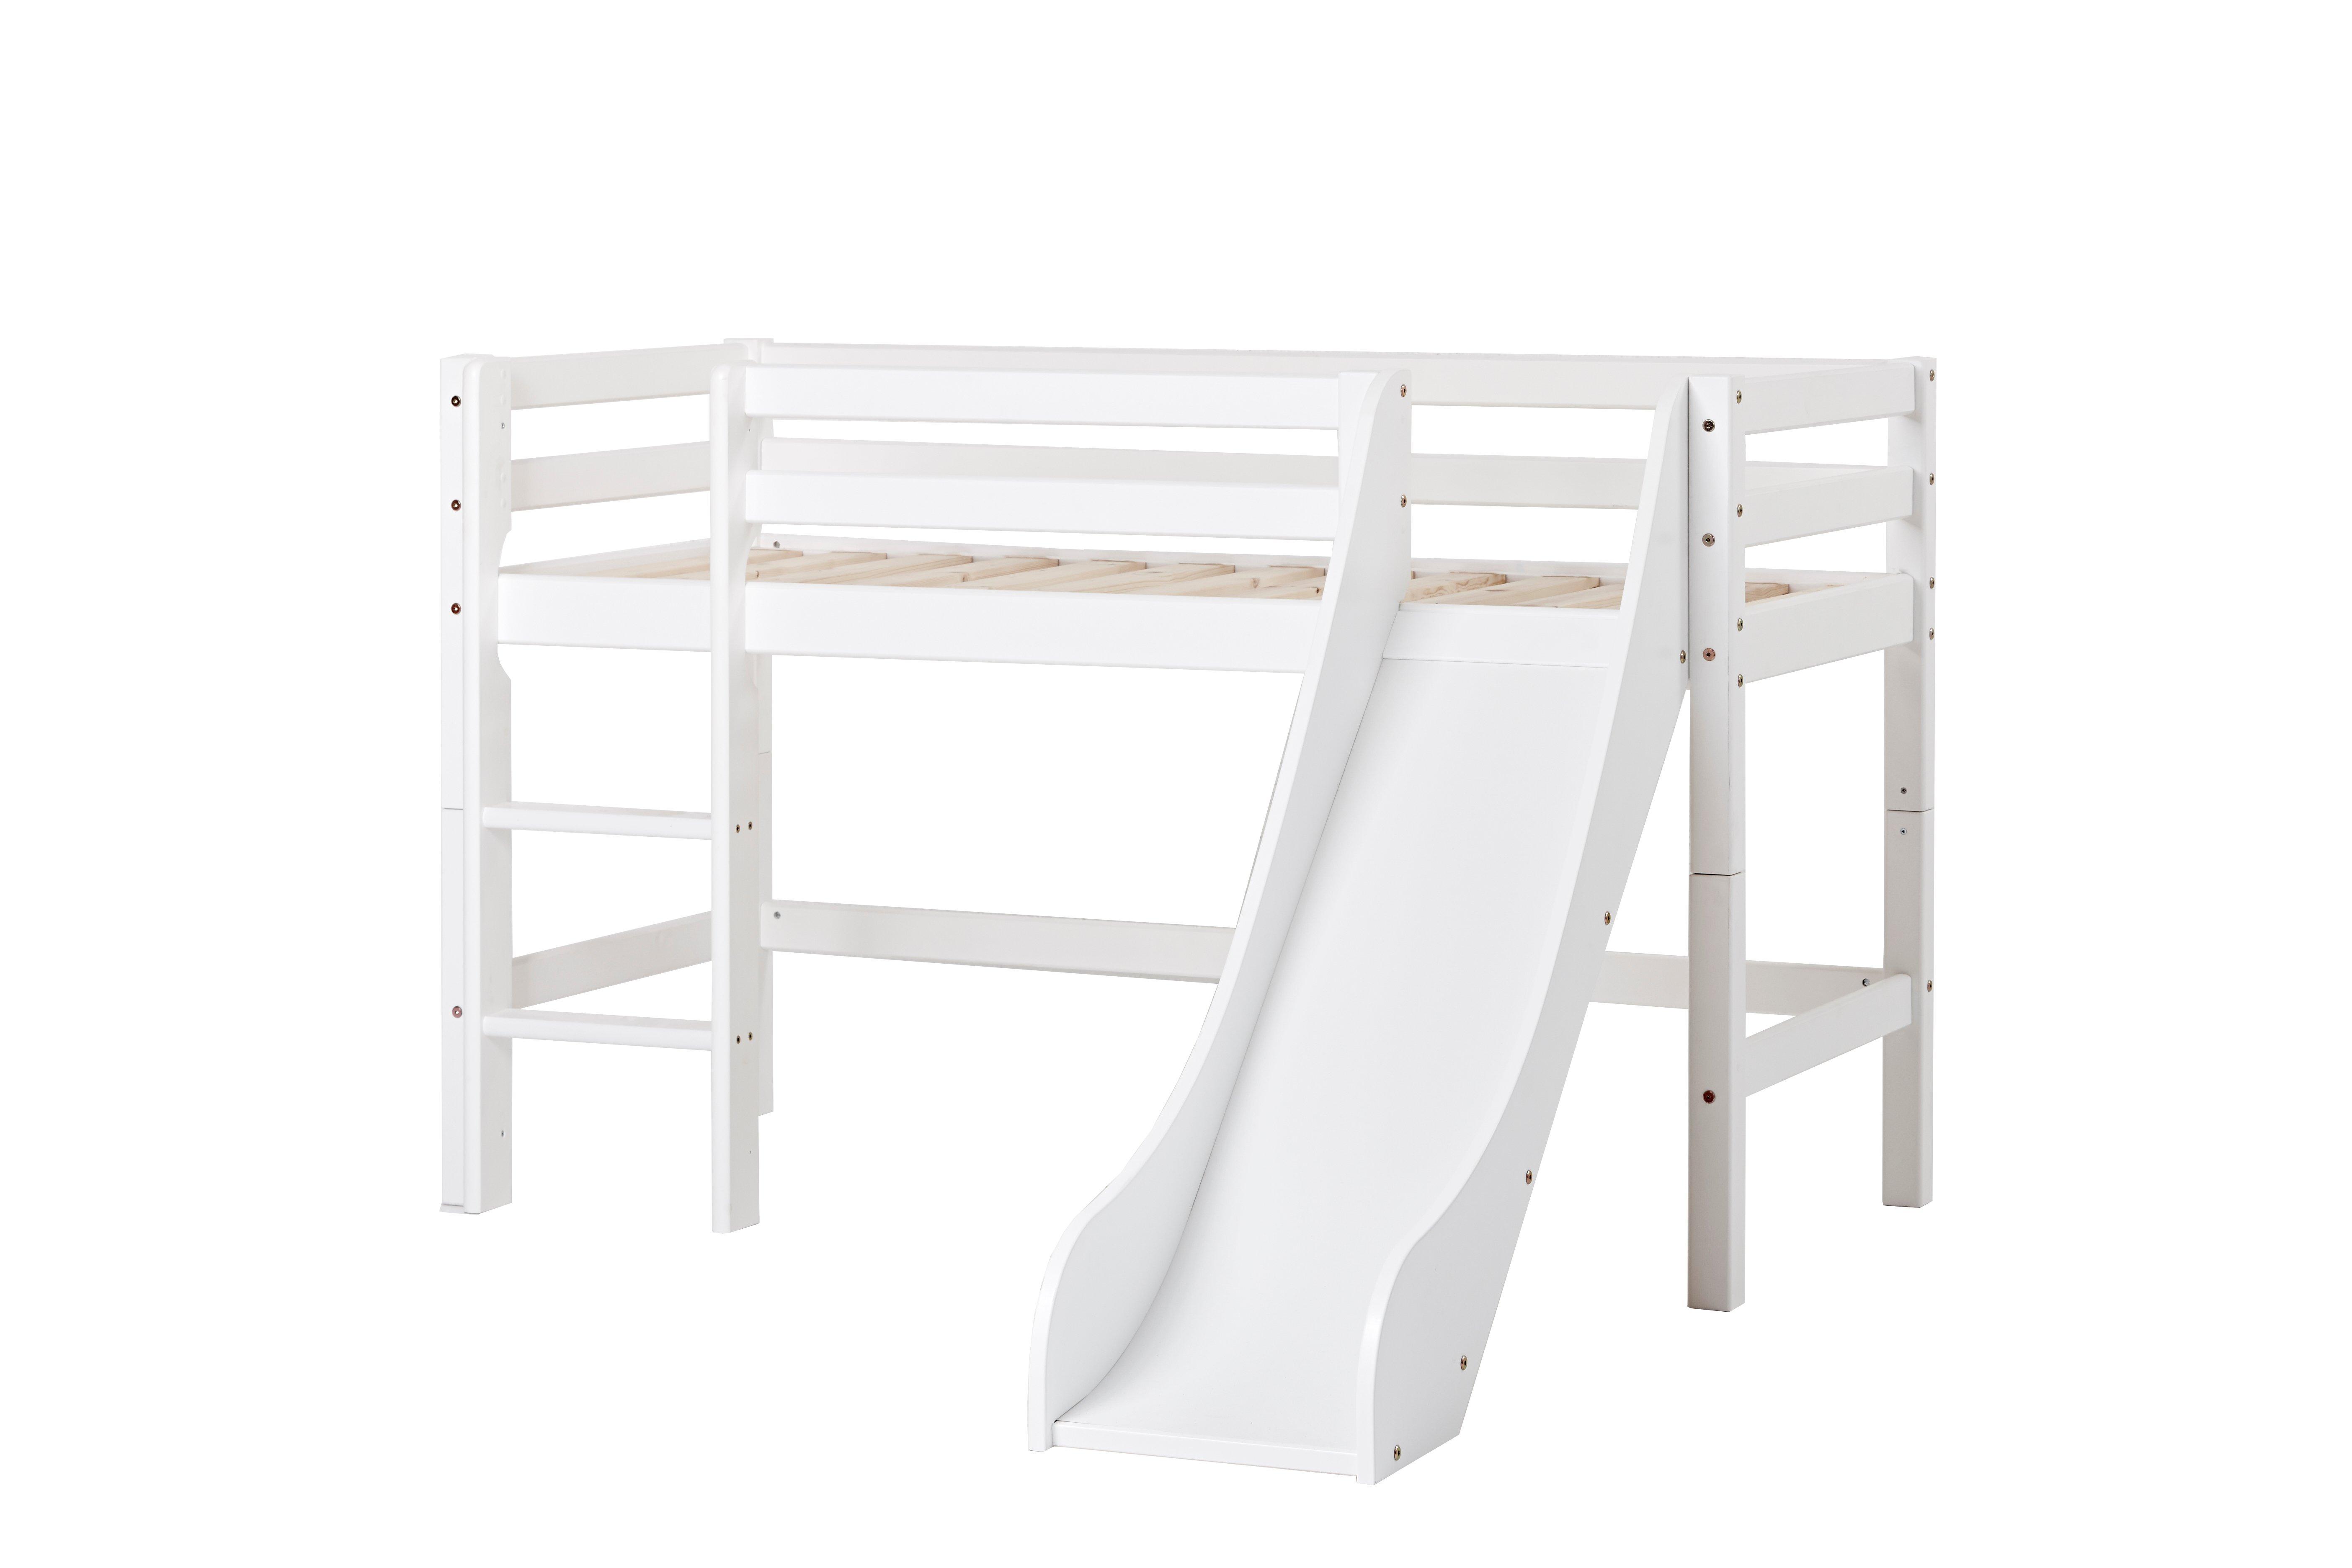 Hoppekids - BASIC Half-high bed with slide 70x160 cm - White